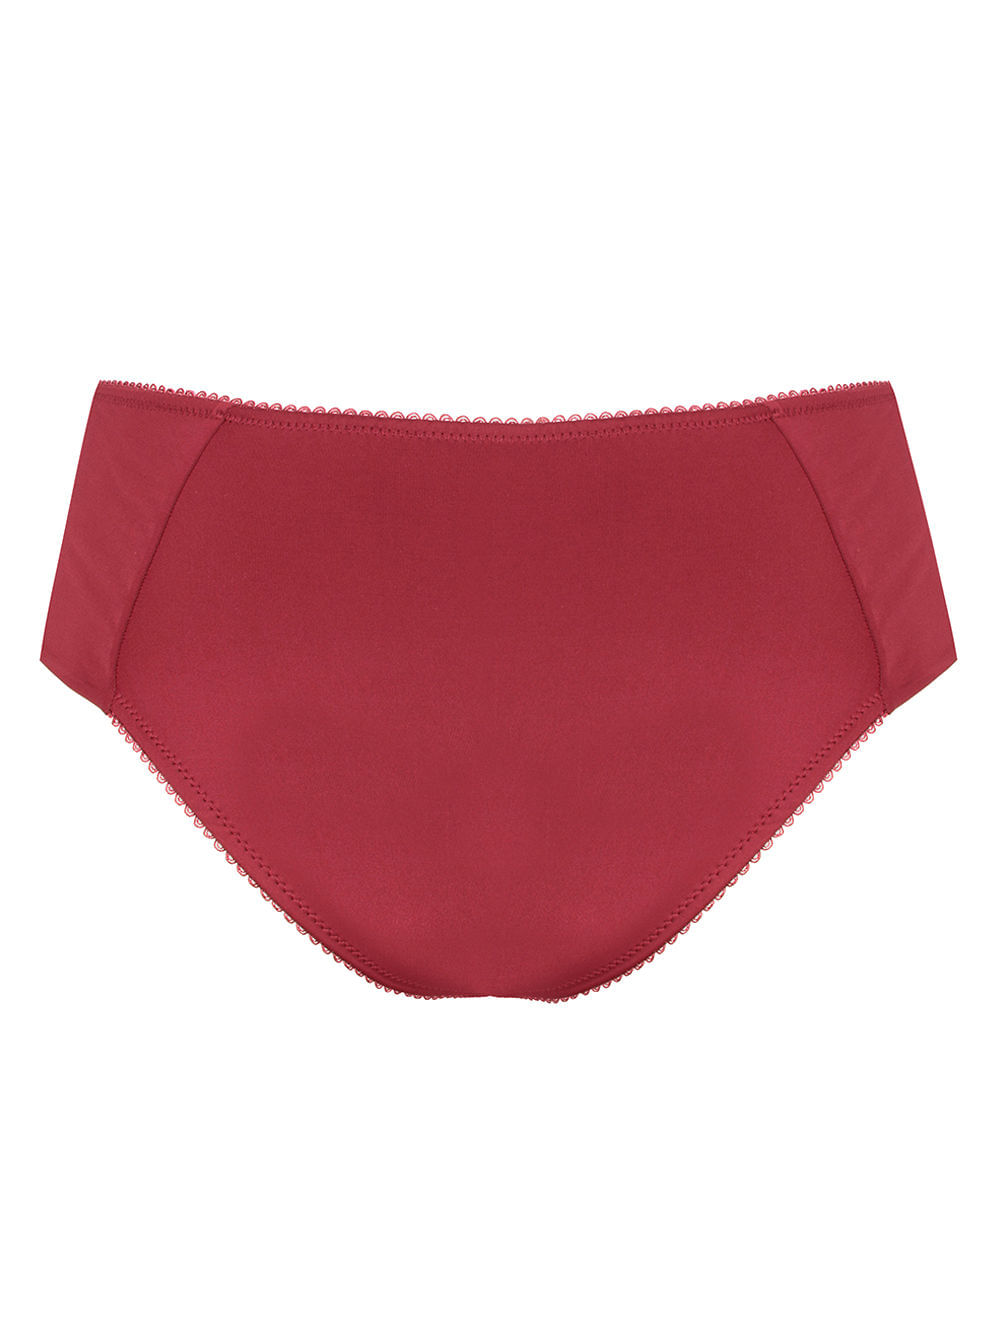 2ddeaa85a1 ... calcinha-cintura-alta-vermelha-40035